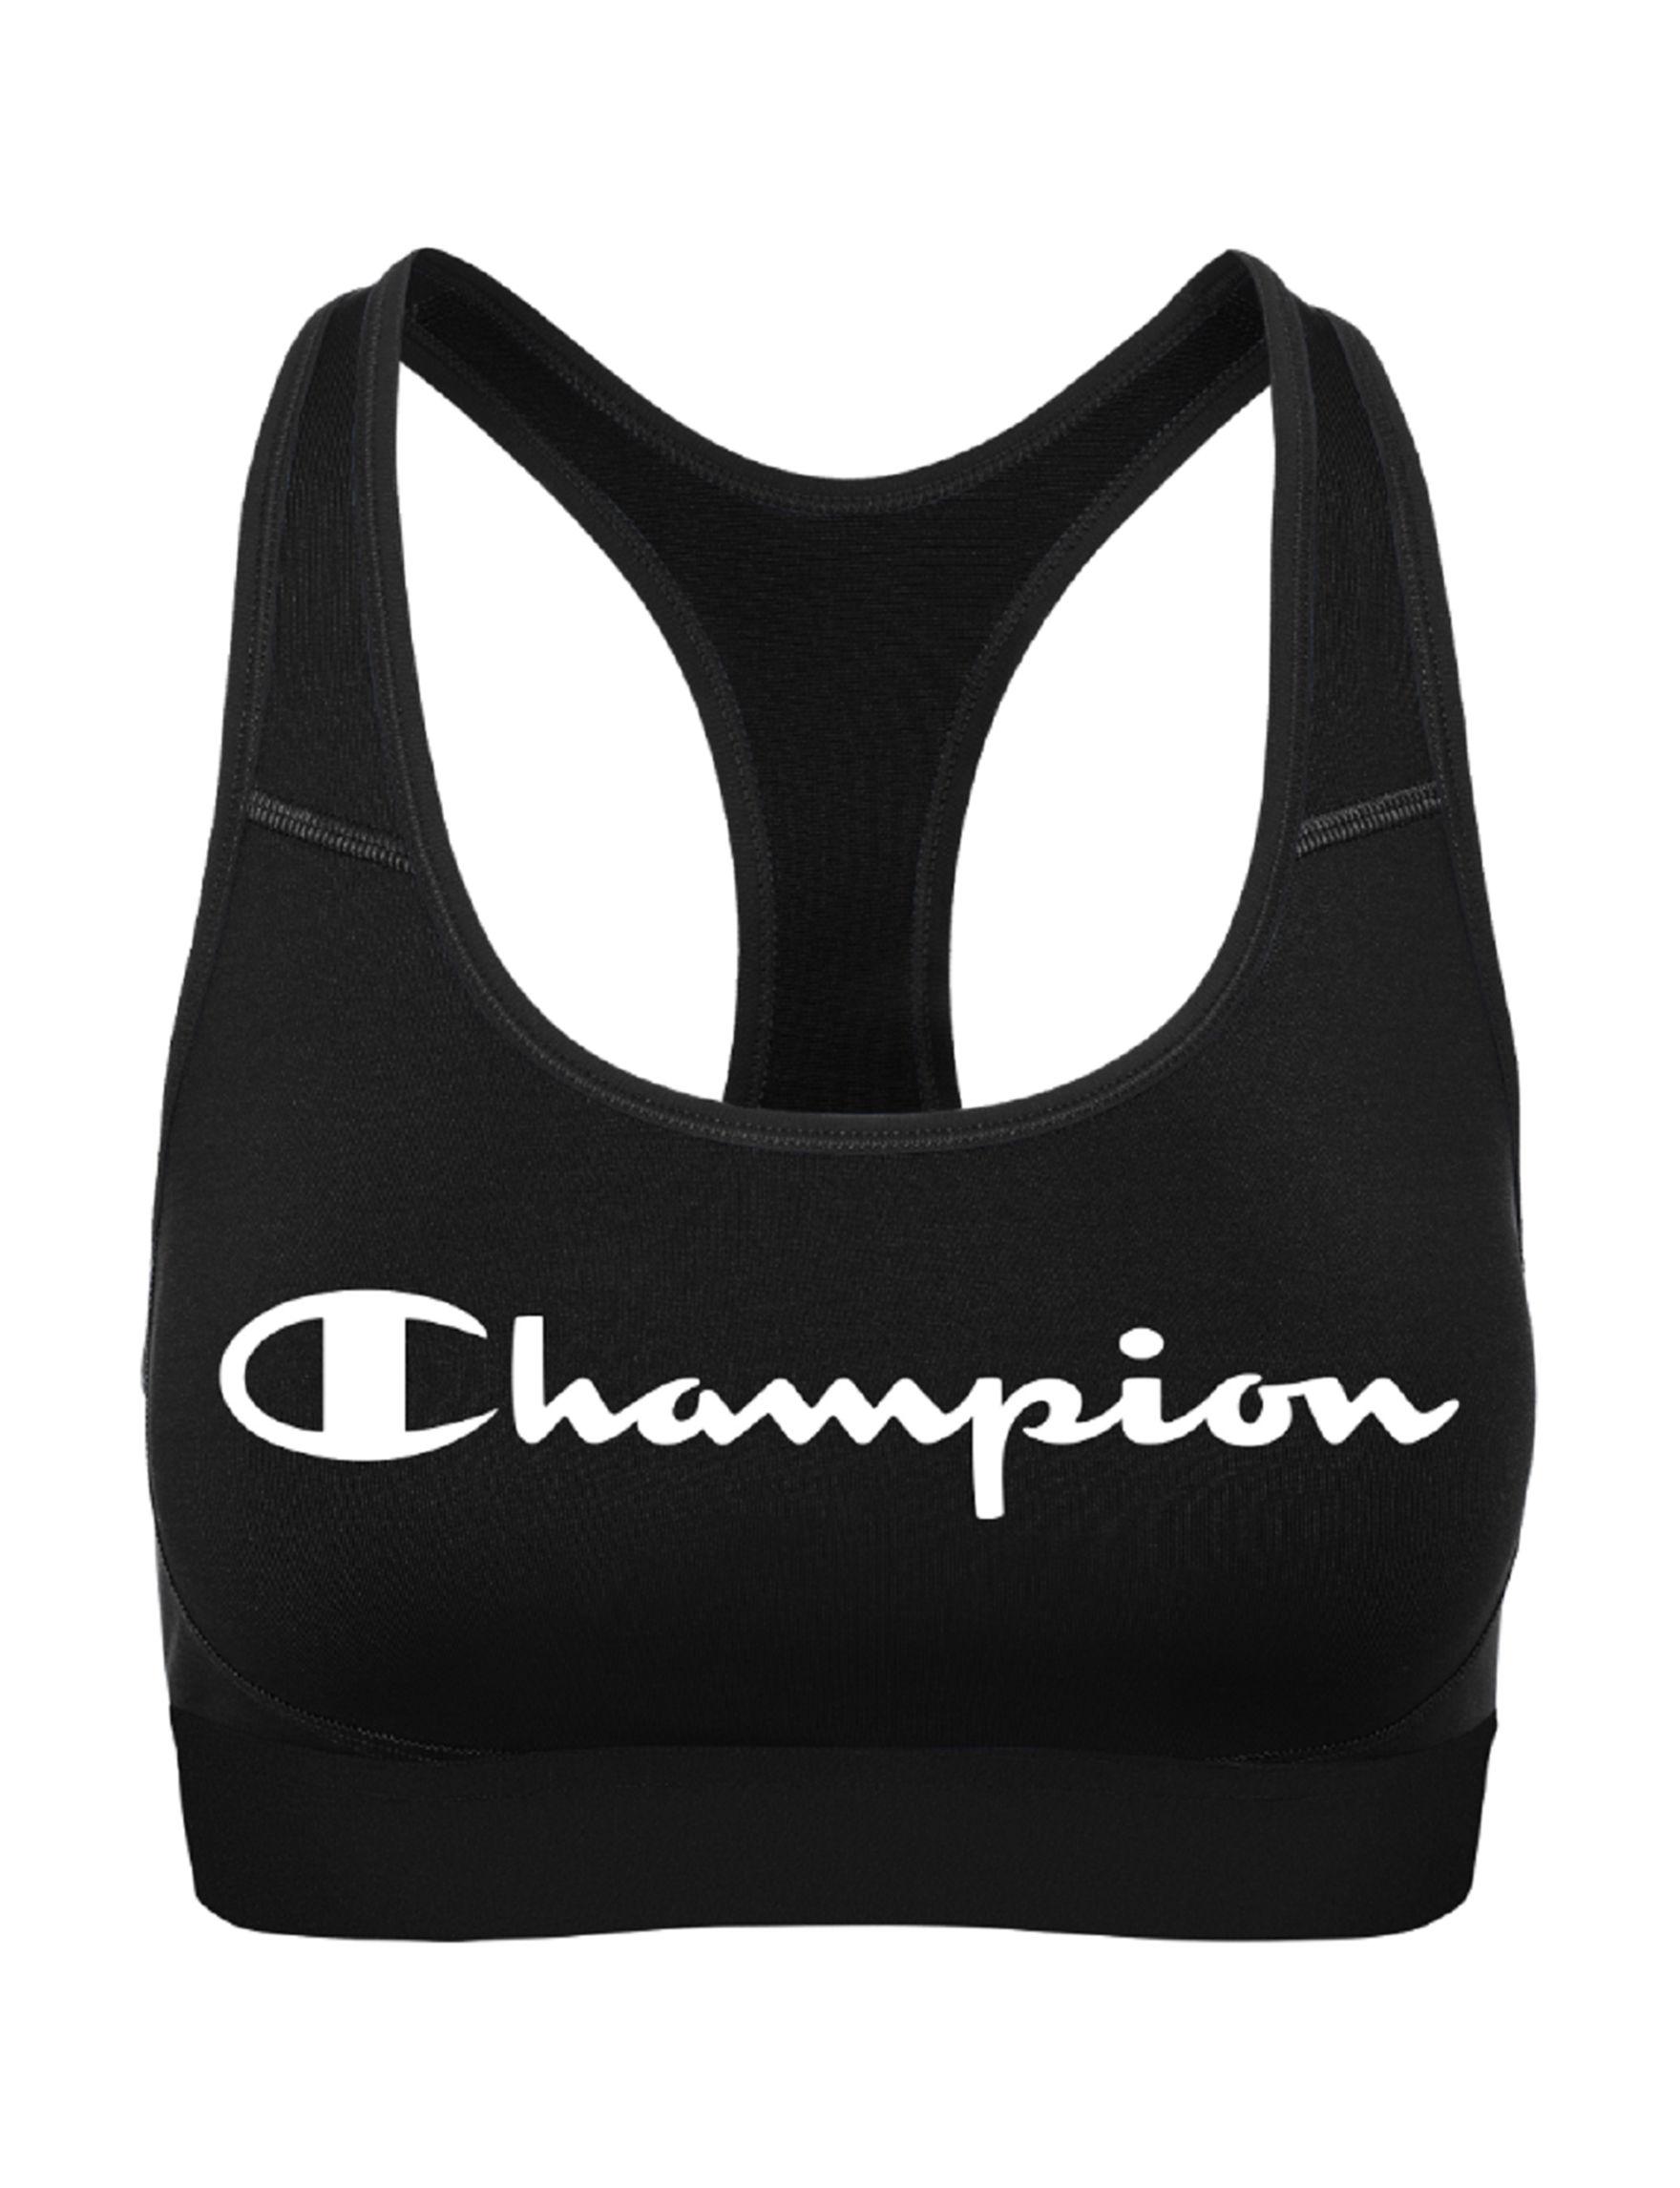 Champion Black Bras Sports Bra